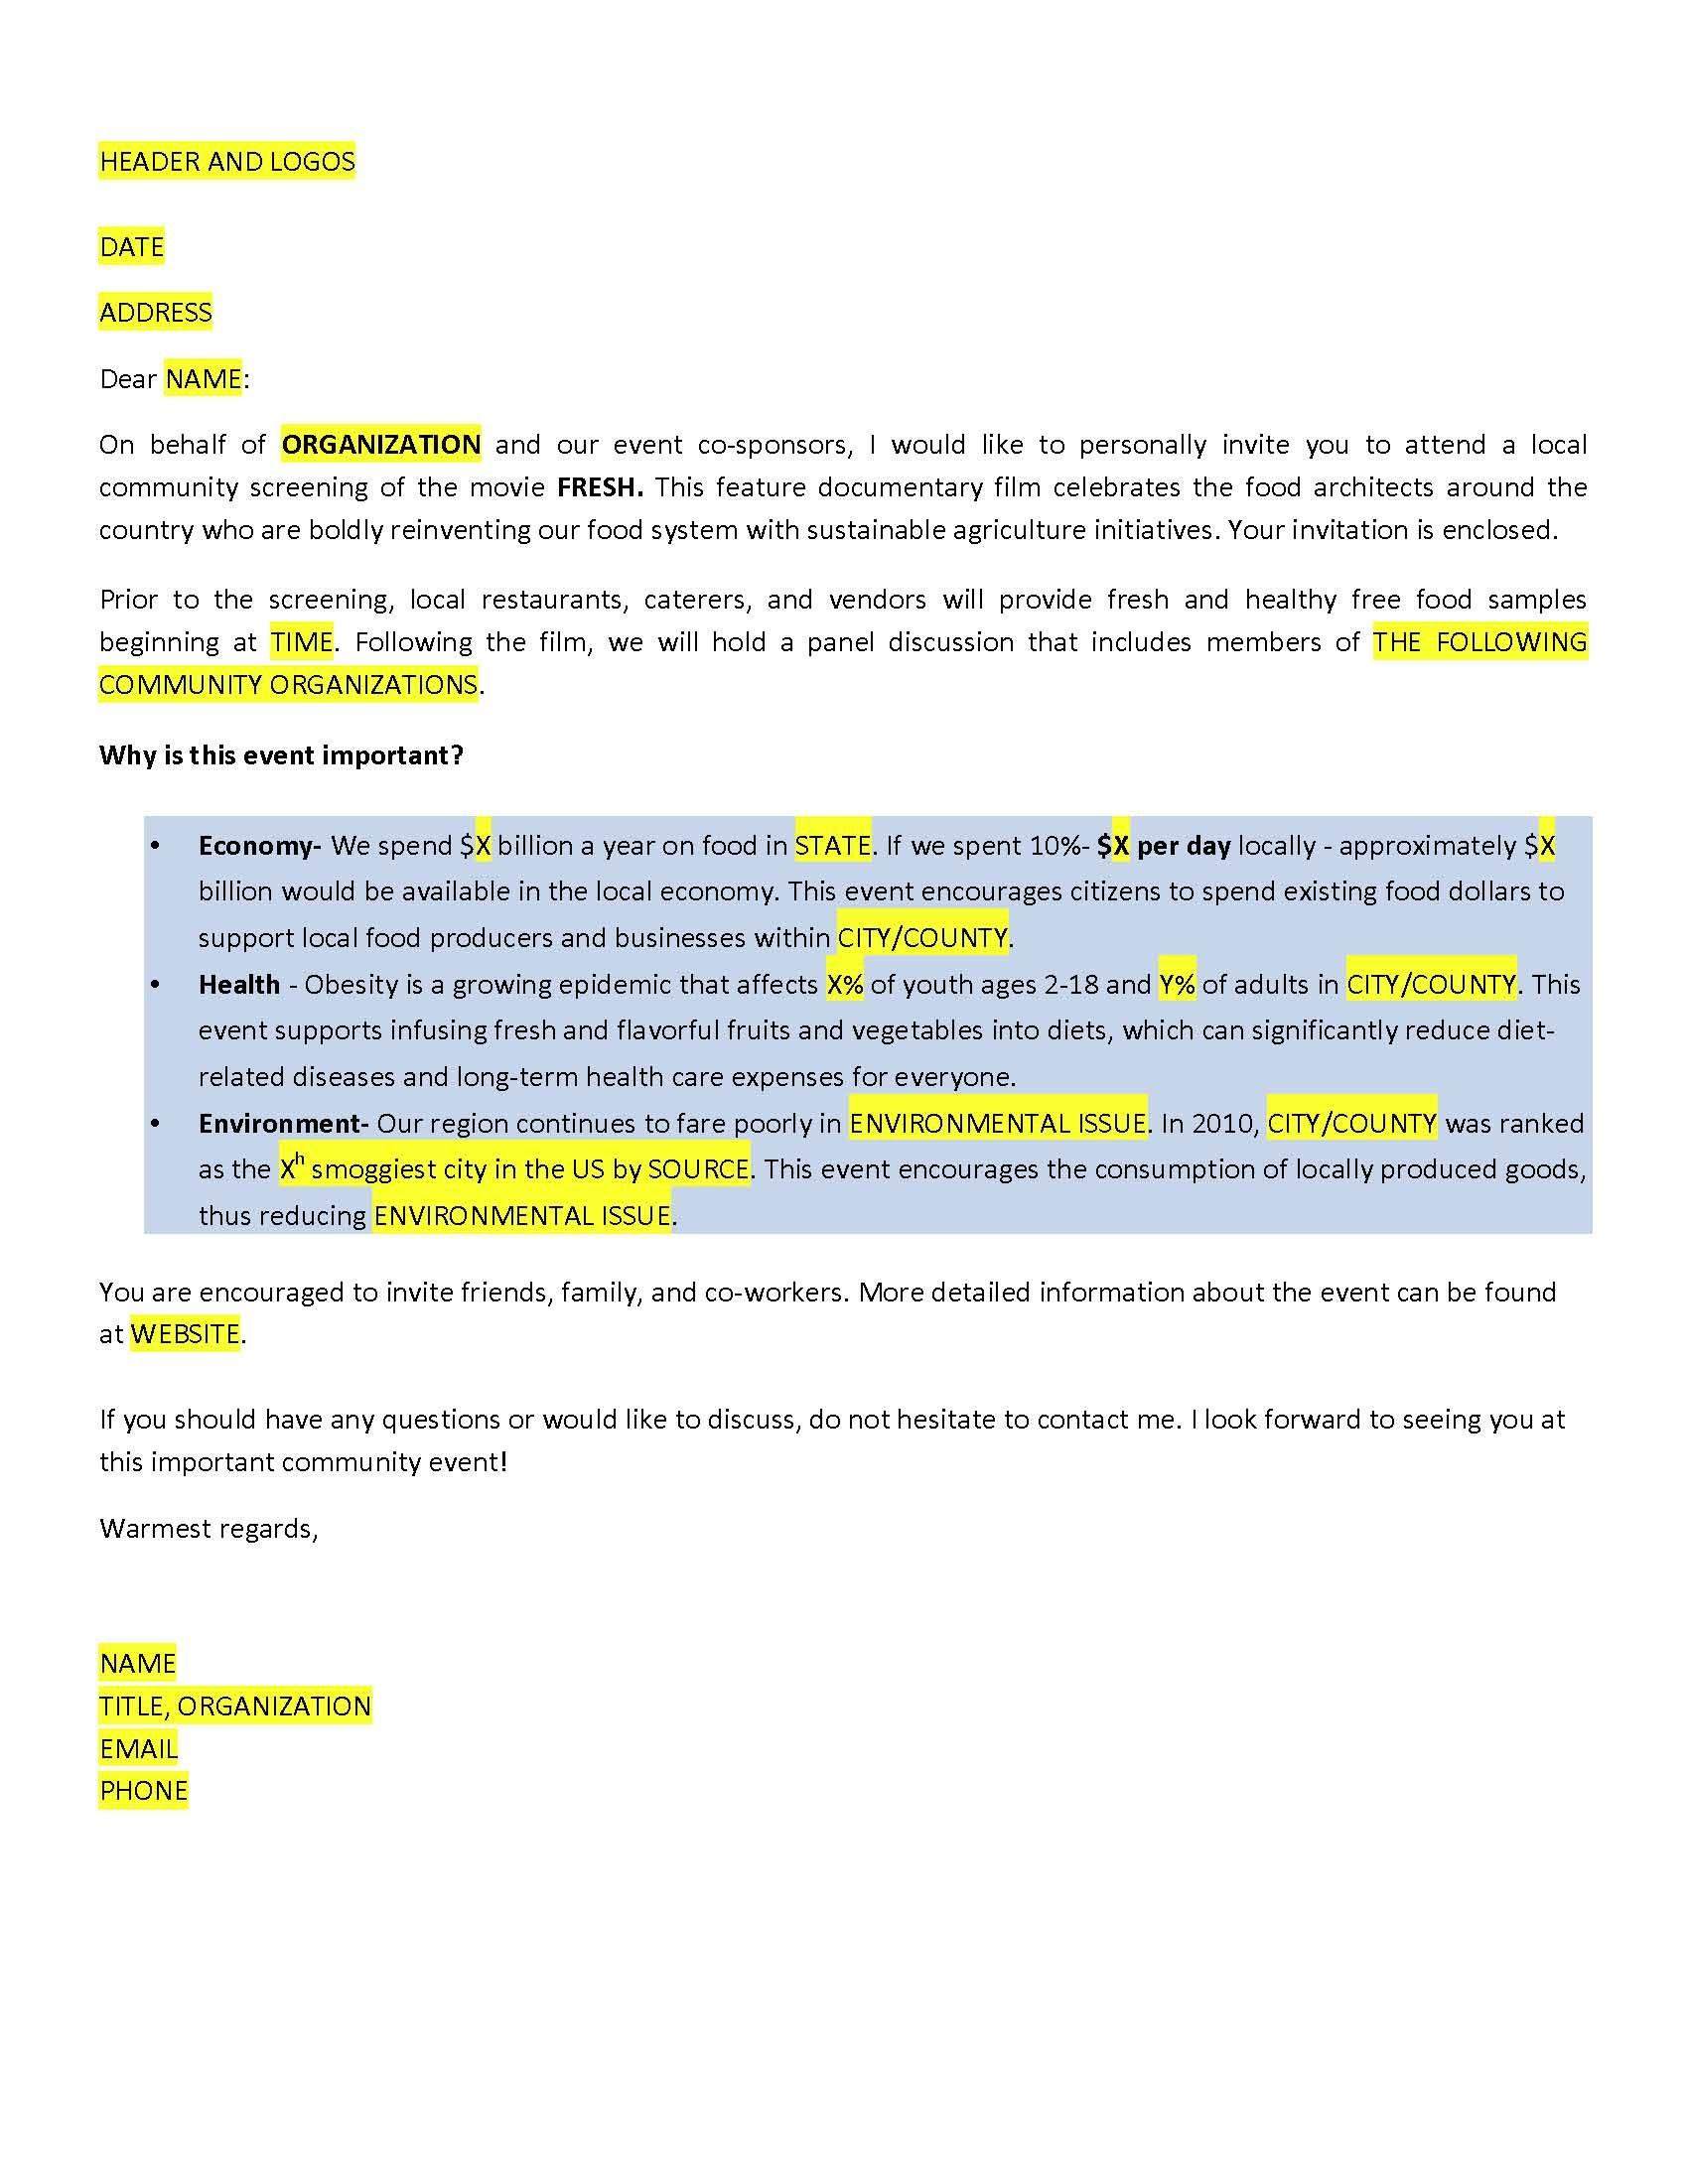 Sample Invitation Letter Invitation Letters For AllVisa